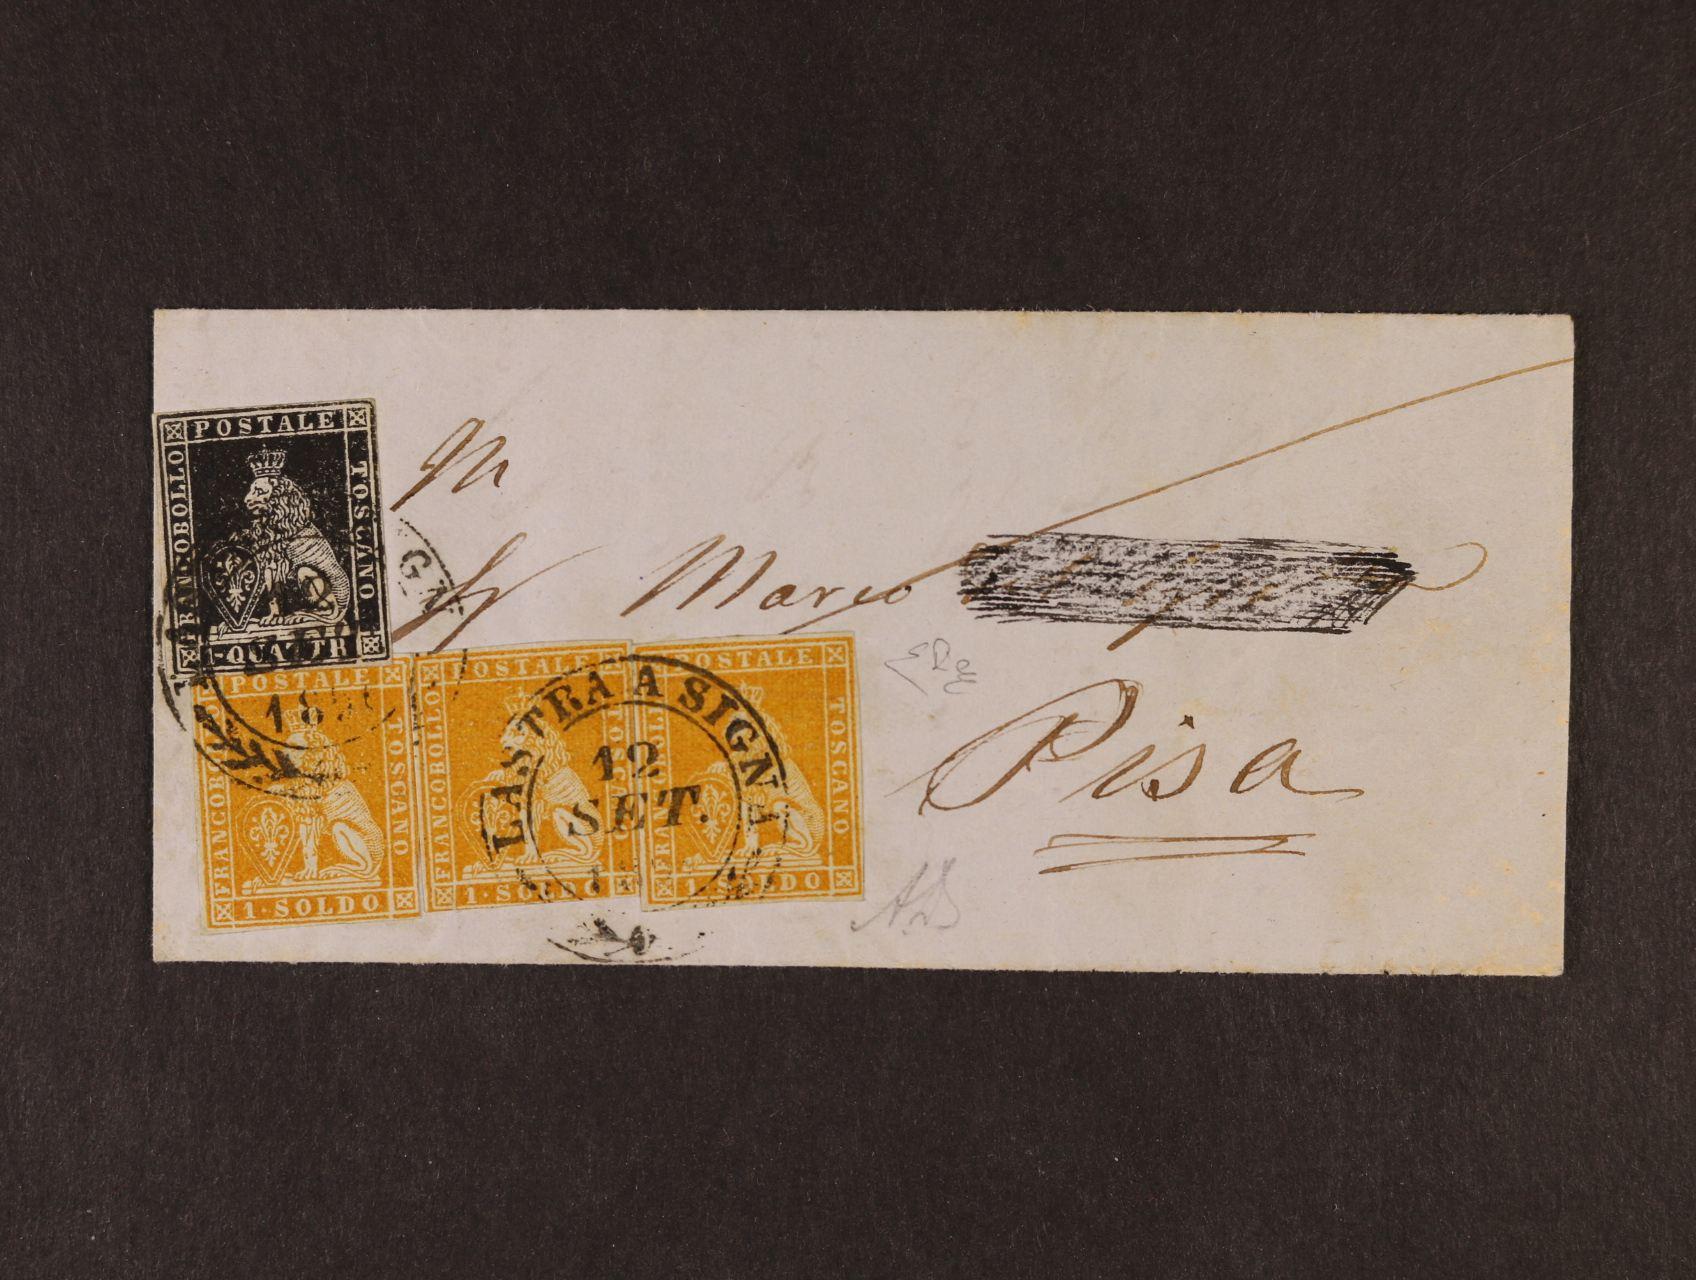 Toskánsko - skl. dopis malého formátu z r. 1856 frank. zn., Sassone č. 1 (1gvattrino), lux. střih, a třemi zn. Sassone č. 2d (1soldo), pod. raz. LASTRA A SIGNA 12. SET. přích. raz. PISA 12.SEPT.1856, kat. Sassone pro tuto frankaturu uvádí min. 45000 EUR, atest Enzo Diena